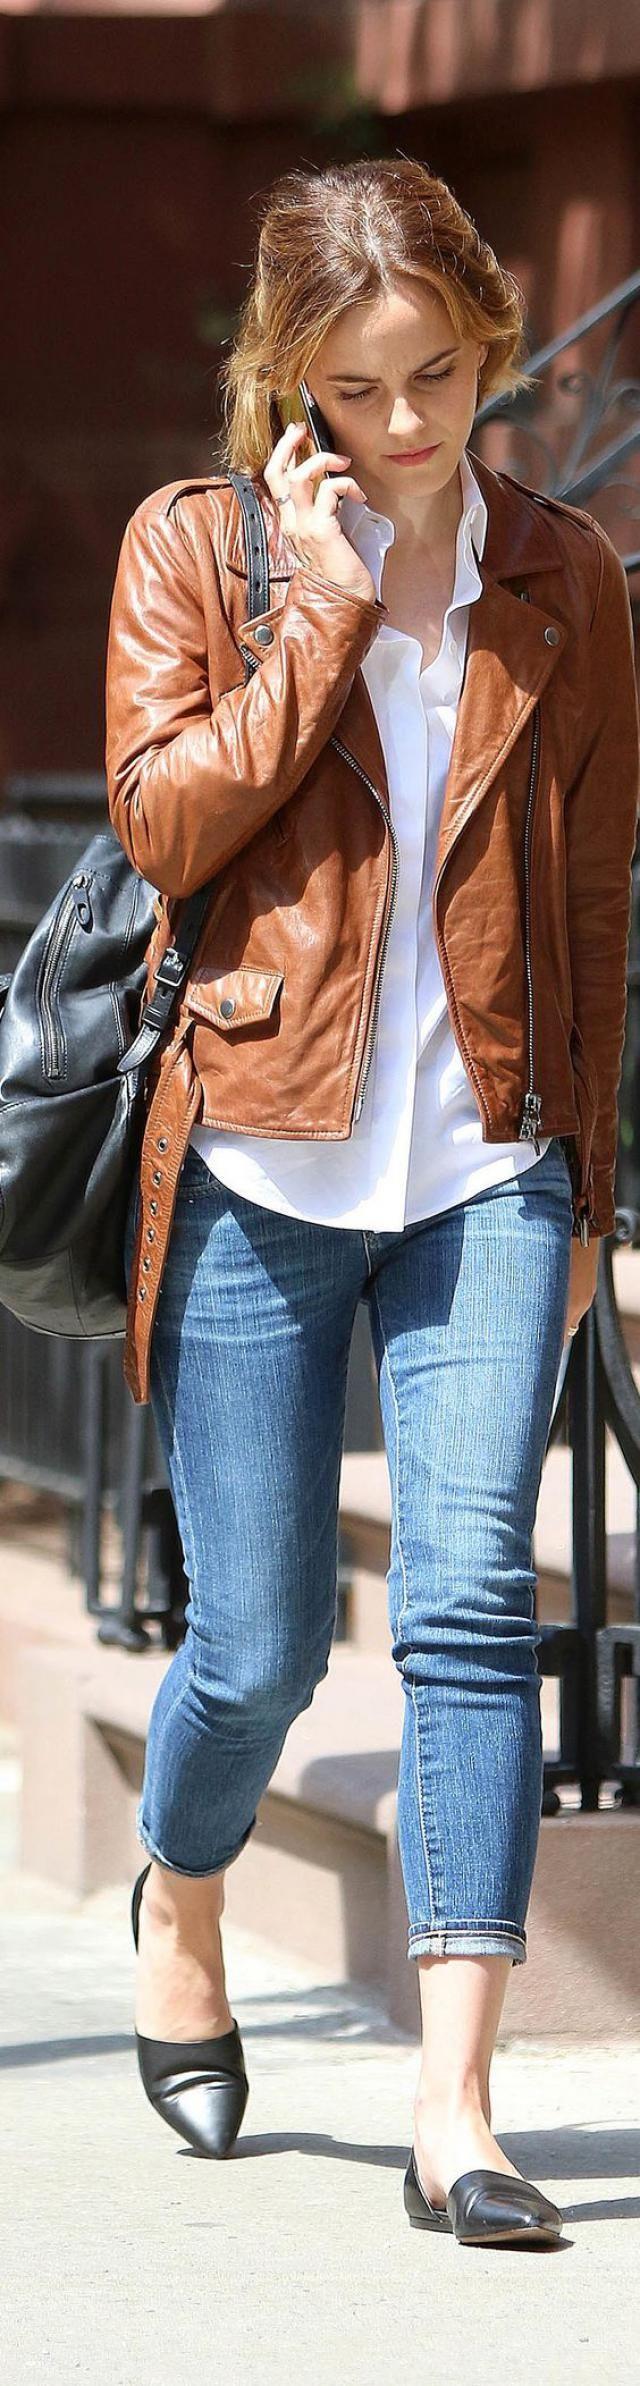 Teen style,good jacket!!